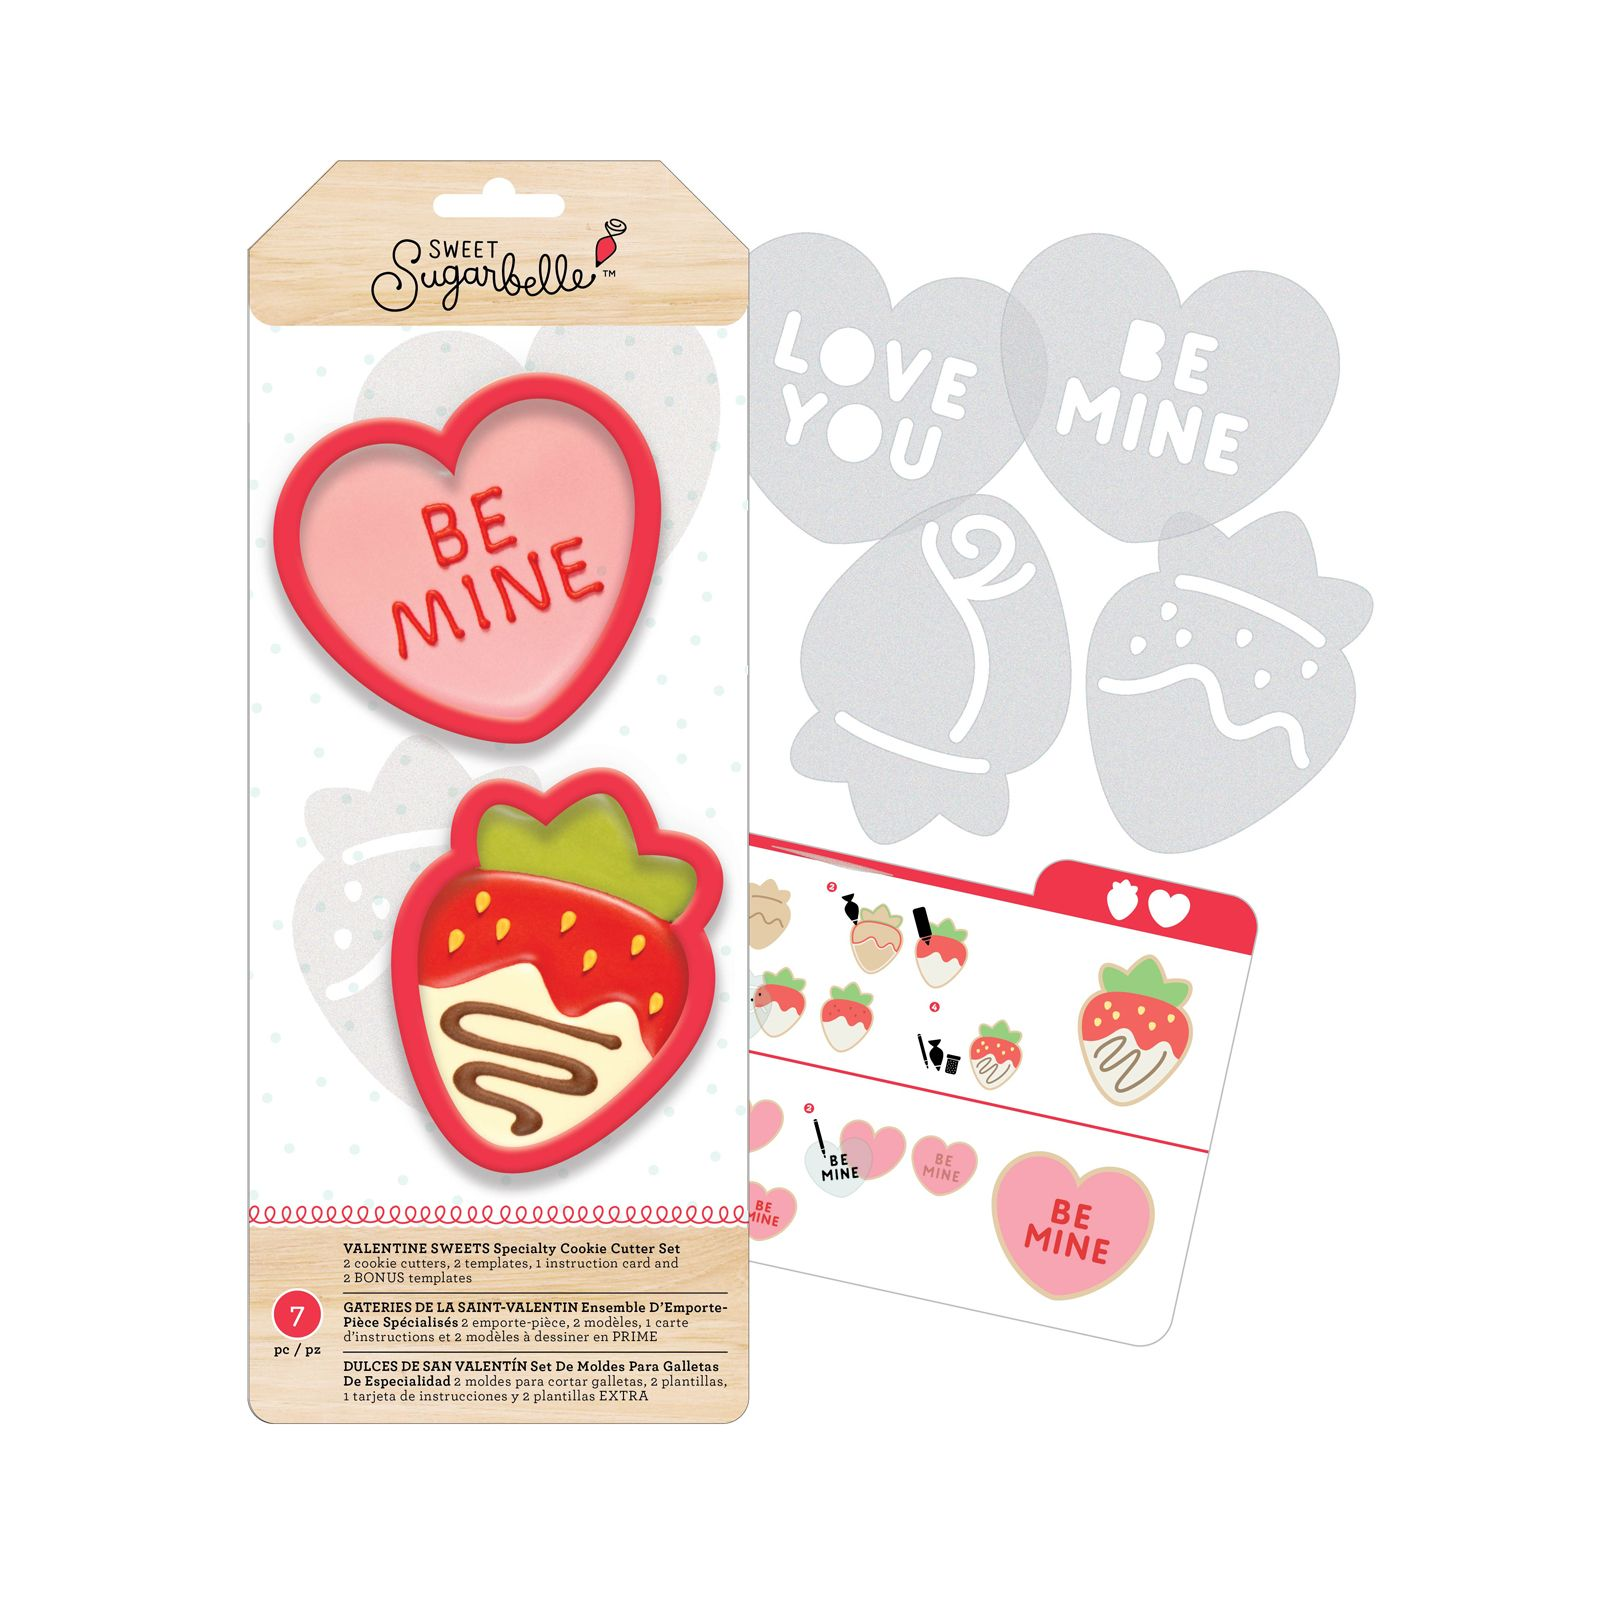 Strawberry Cookie Cutter Set